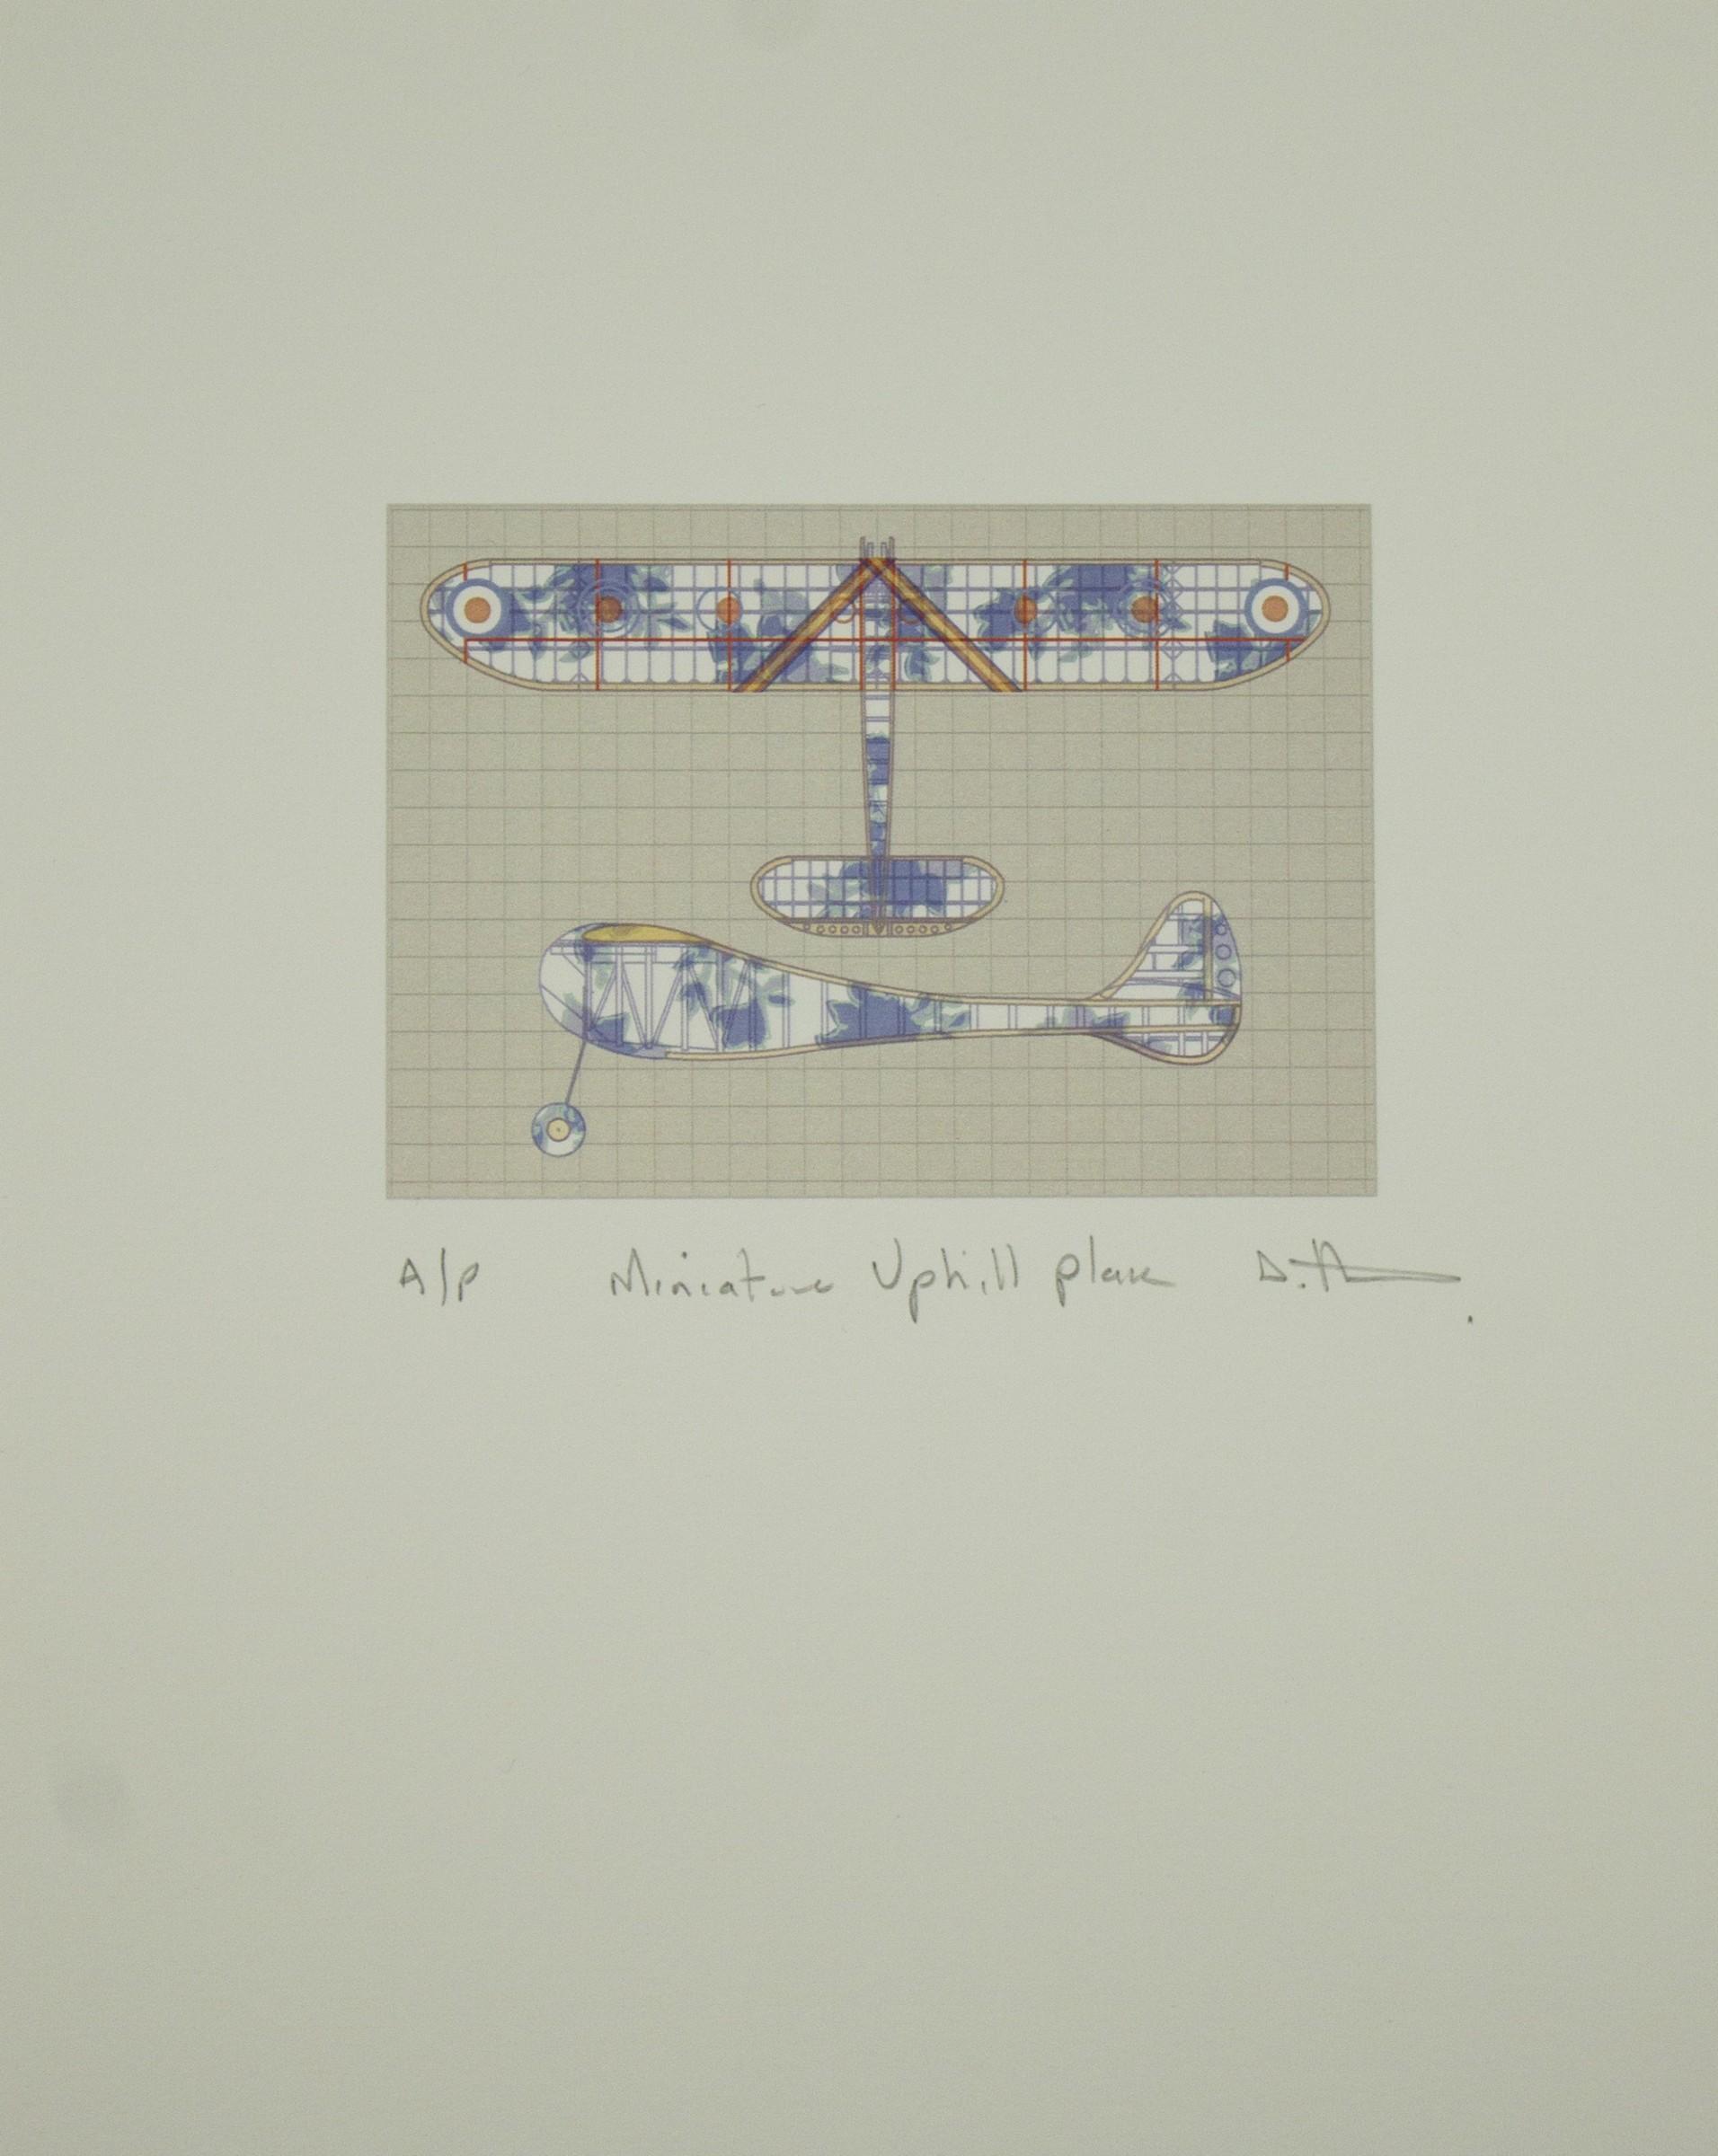 "<span class=""link fancybox-details-link""><a href=""/exhibitions/23/works/artworks_standalone11251/"">View Detail Page</a></span><div class=""artist""><span class=""artist""><strong>Stephen Hoskins RE</strong></span></div><div class=""title""><em>Miniature Uphill Aeroplane</em></div><div class=""medium"">inkjet print</div><div class=""dimensions"">25 x 20cm </div><div class=""edition_details"">Artist proof</div>"